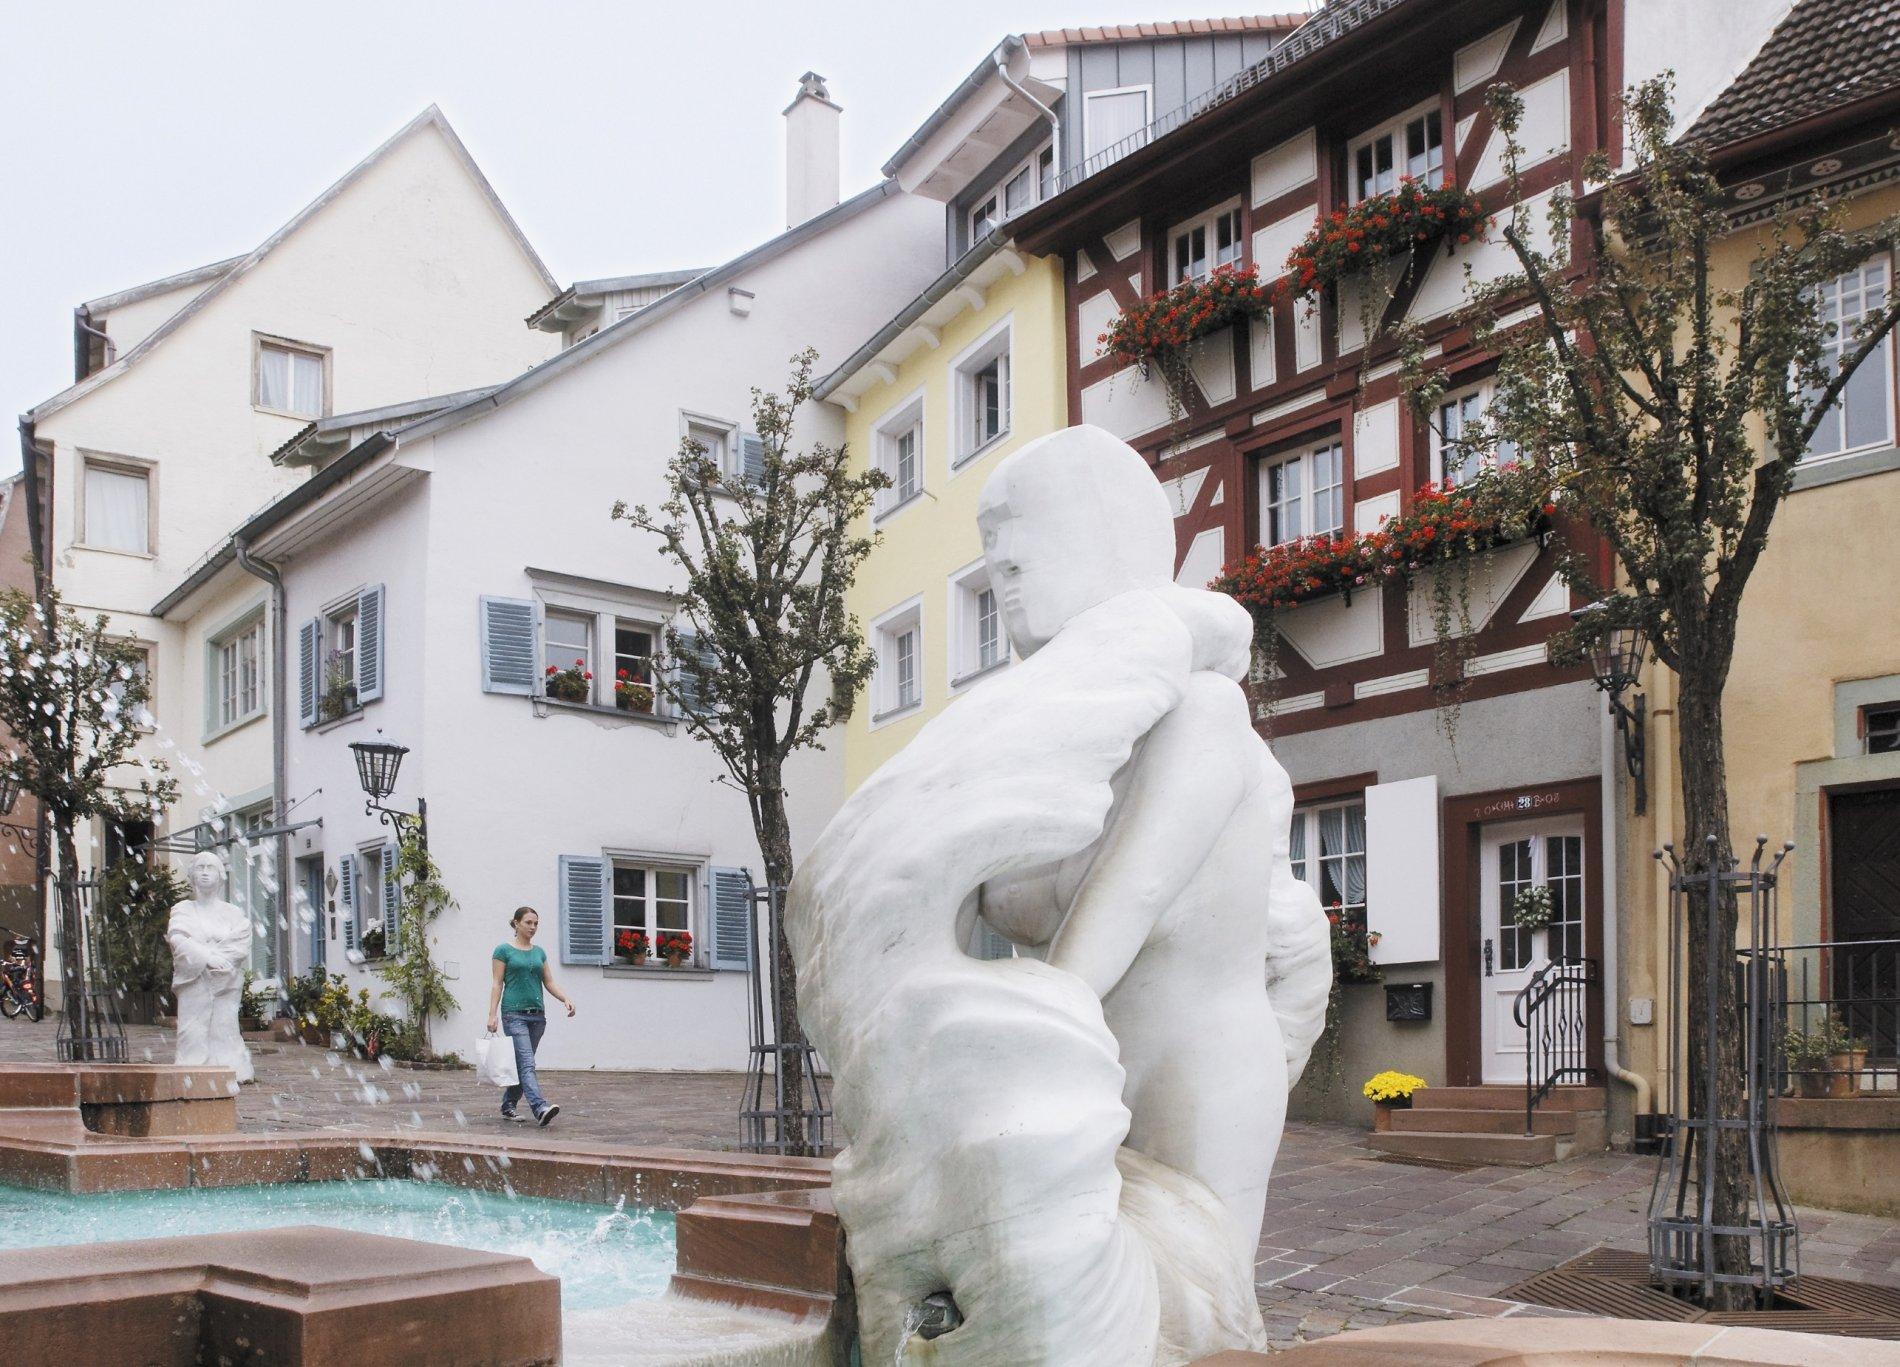 Vorstadtbrunnen